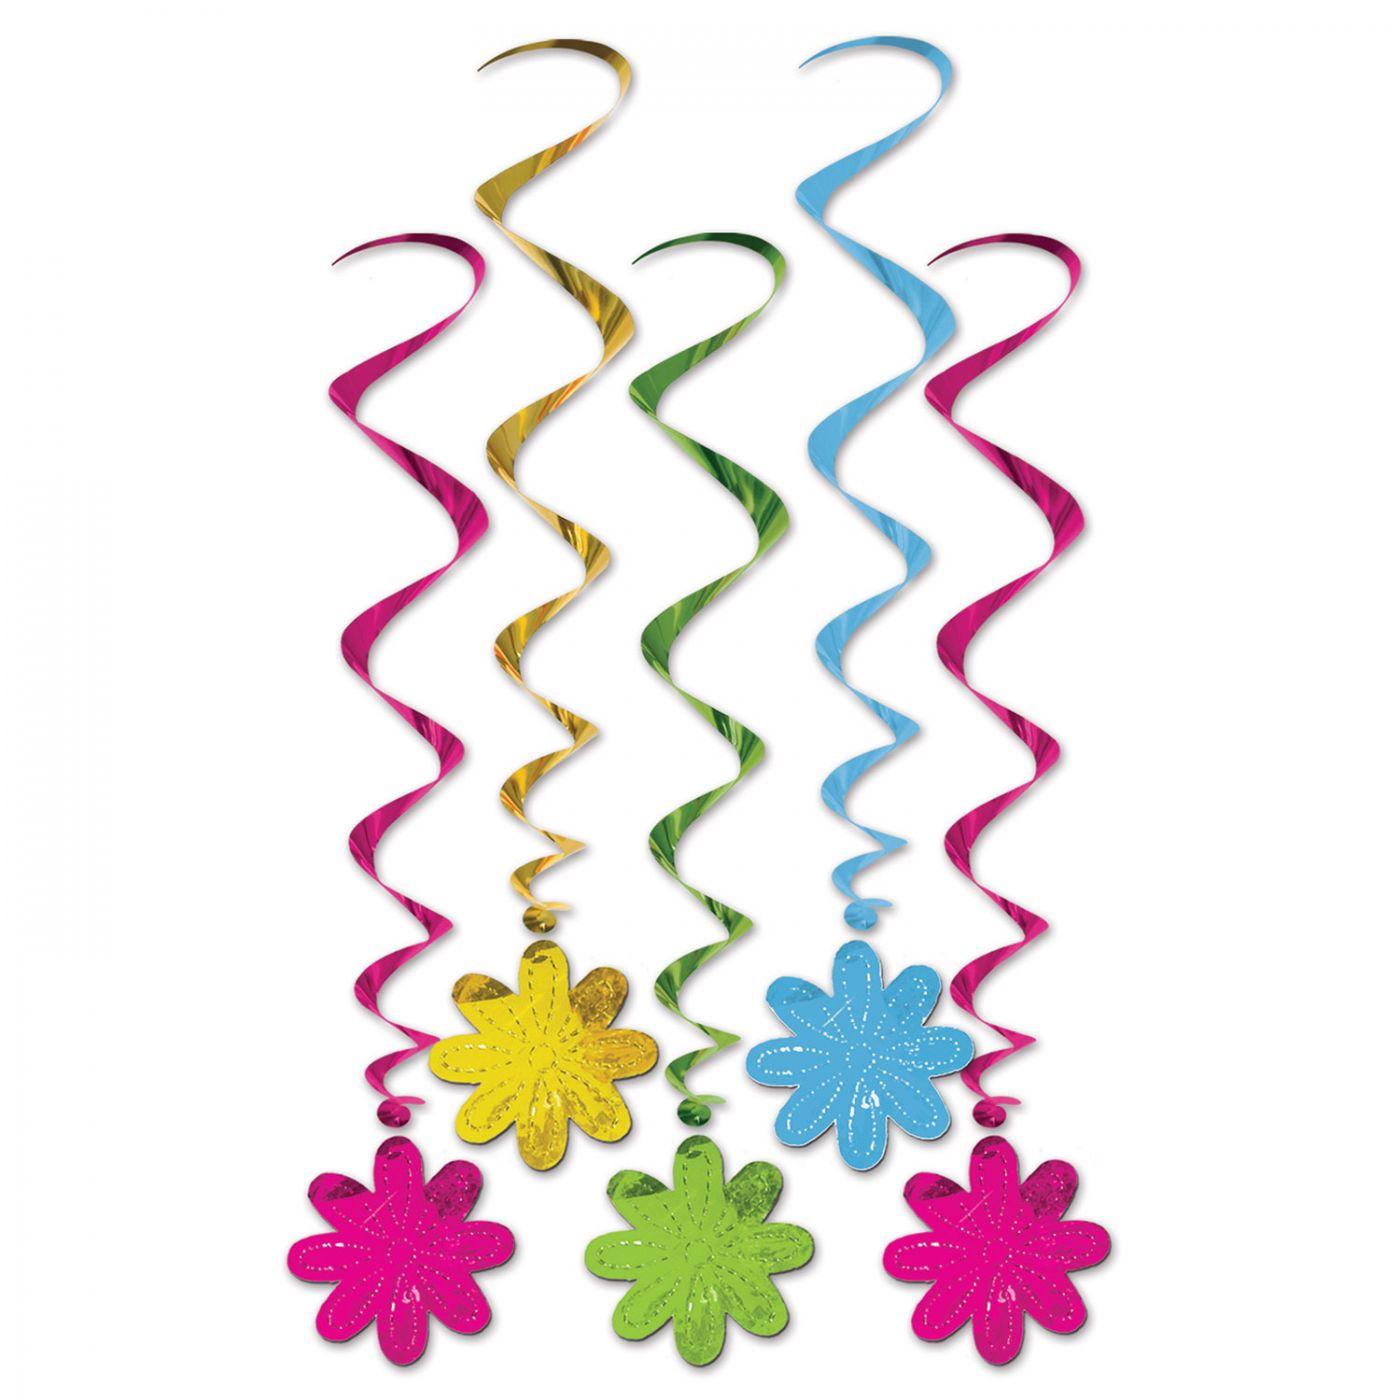 Flower Whirls (6) image